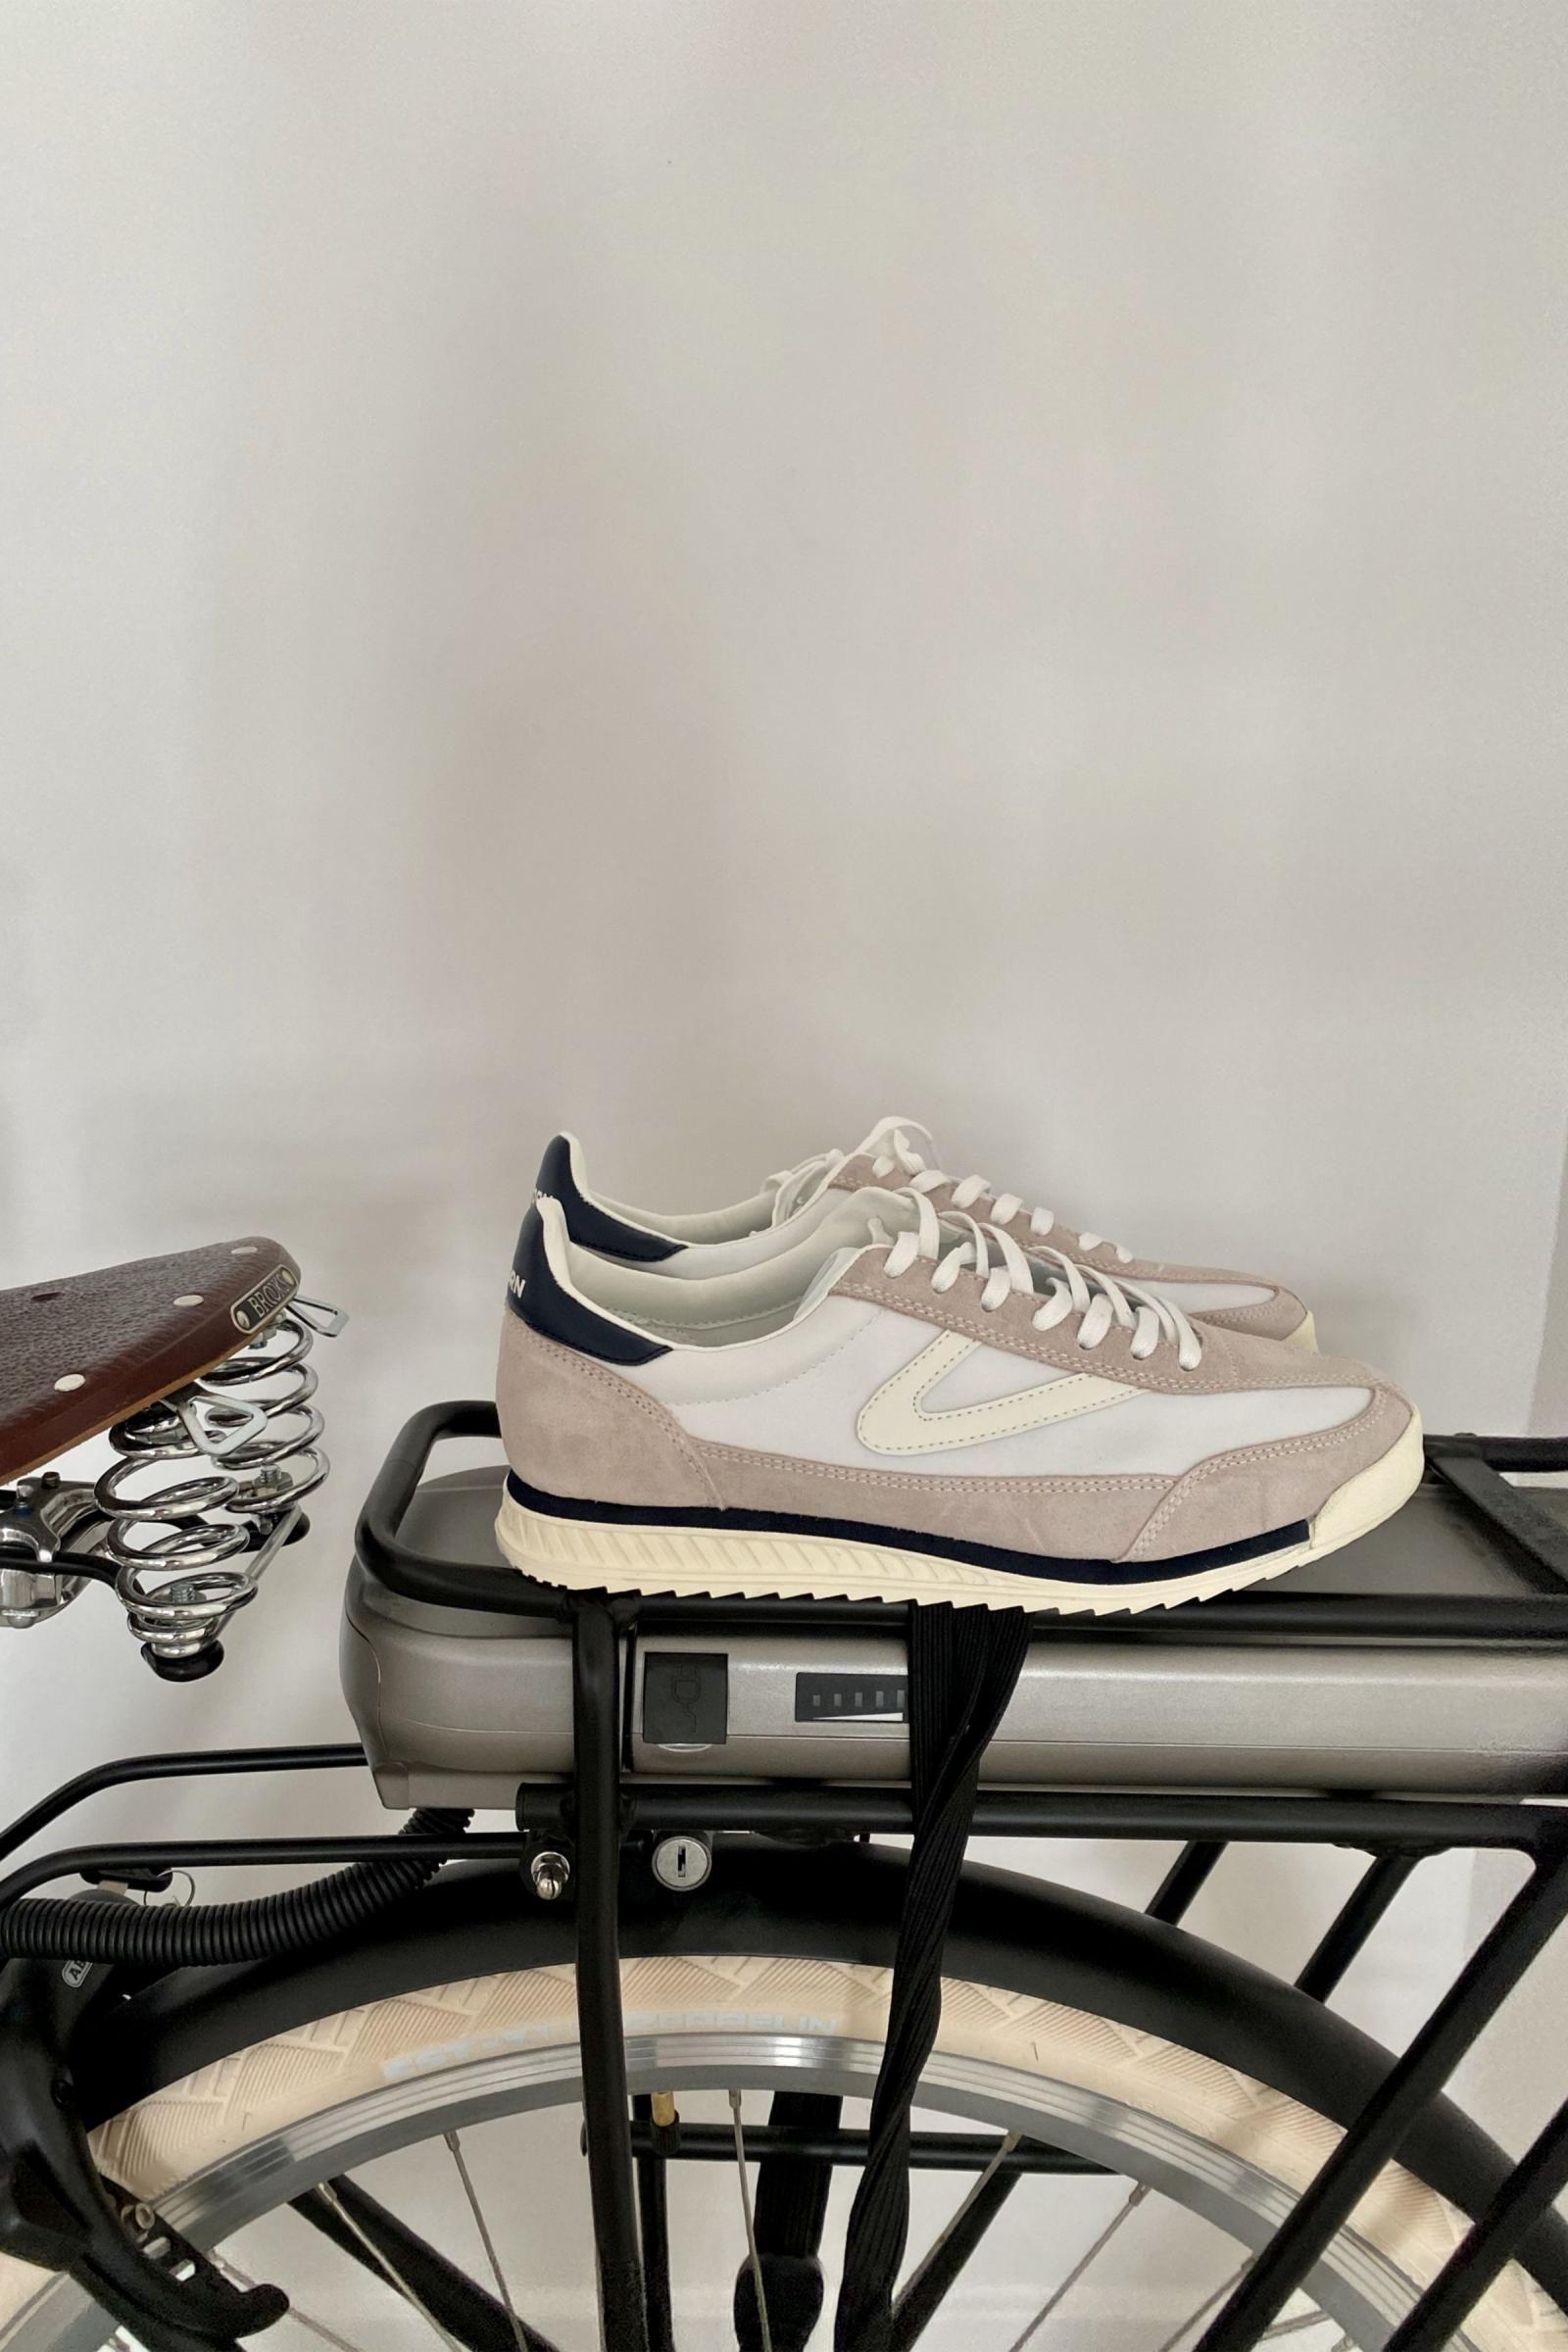 Sneakers, Fashion joggers, Retro sneakers